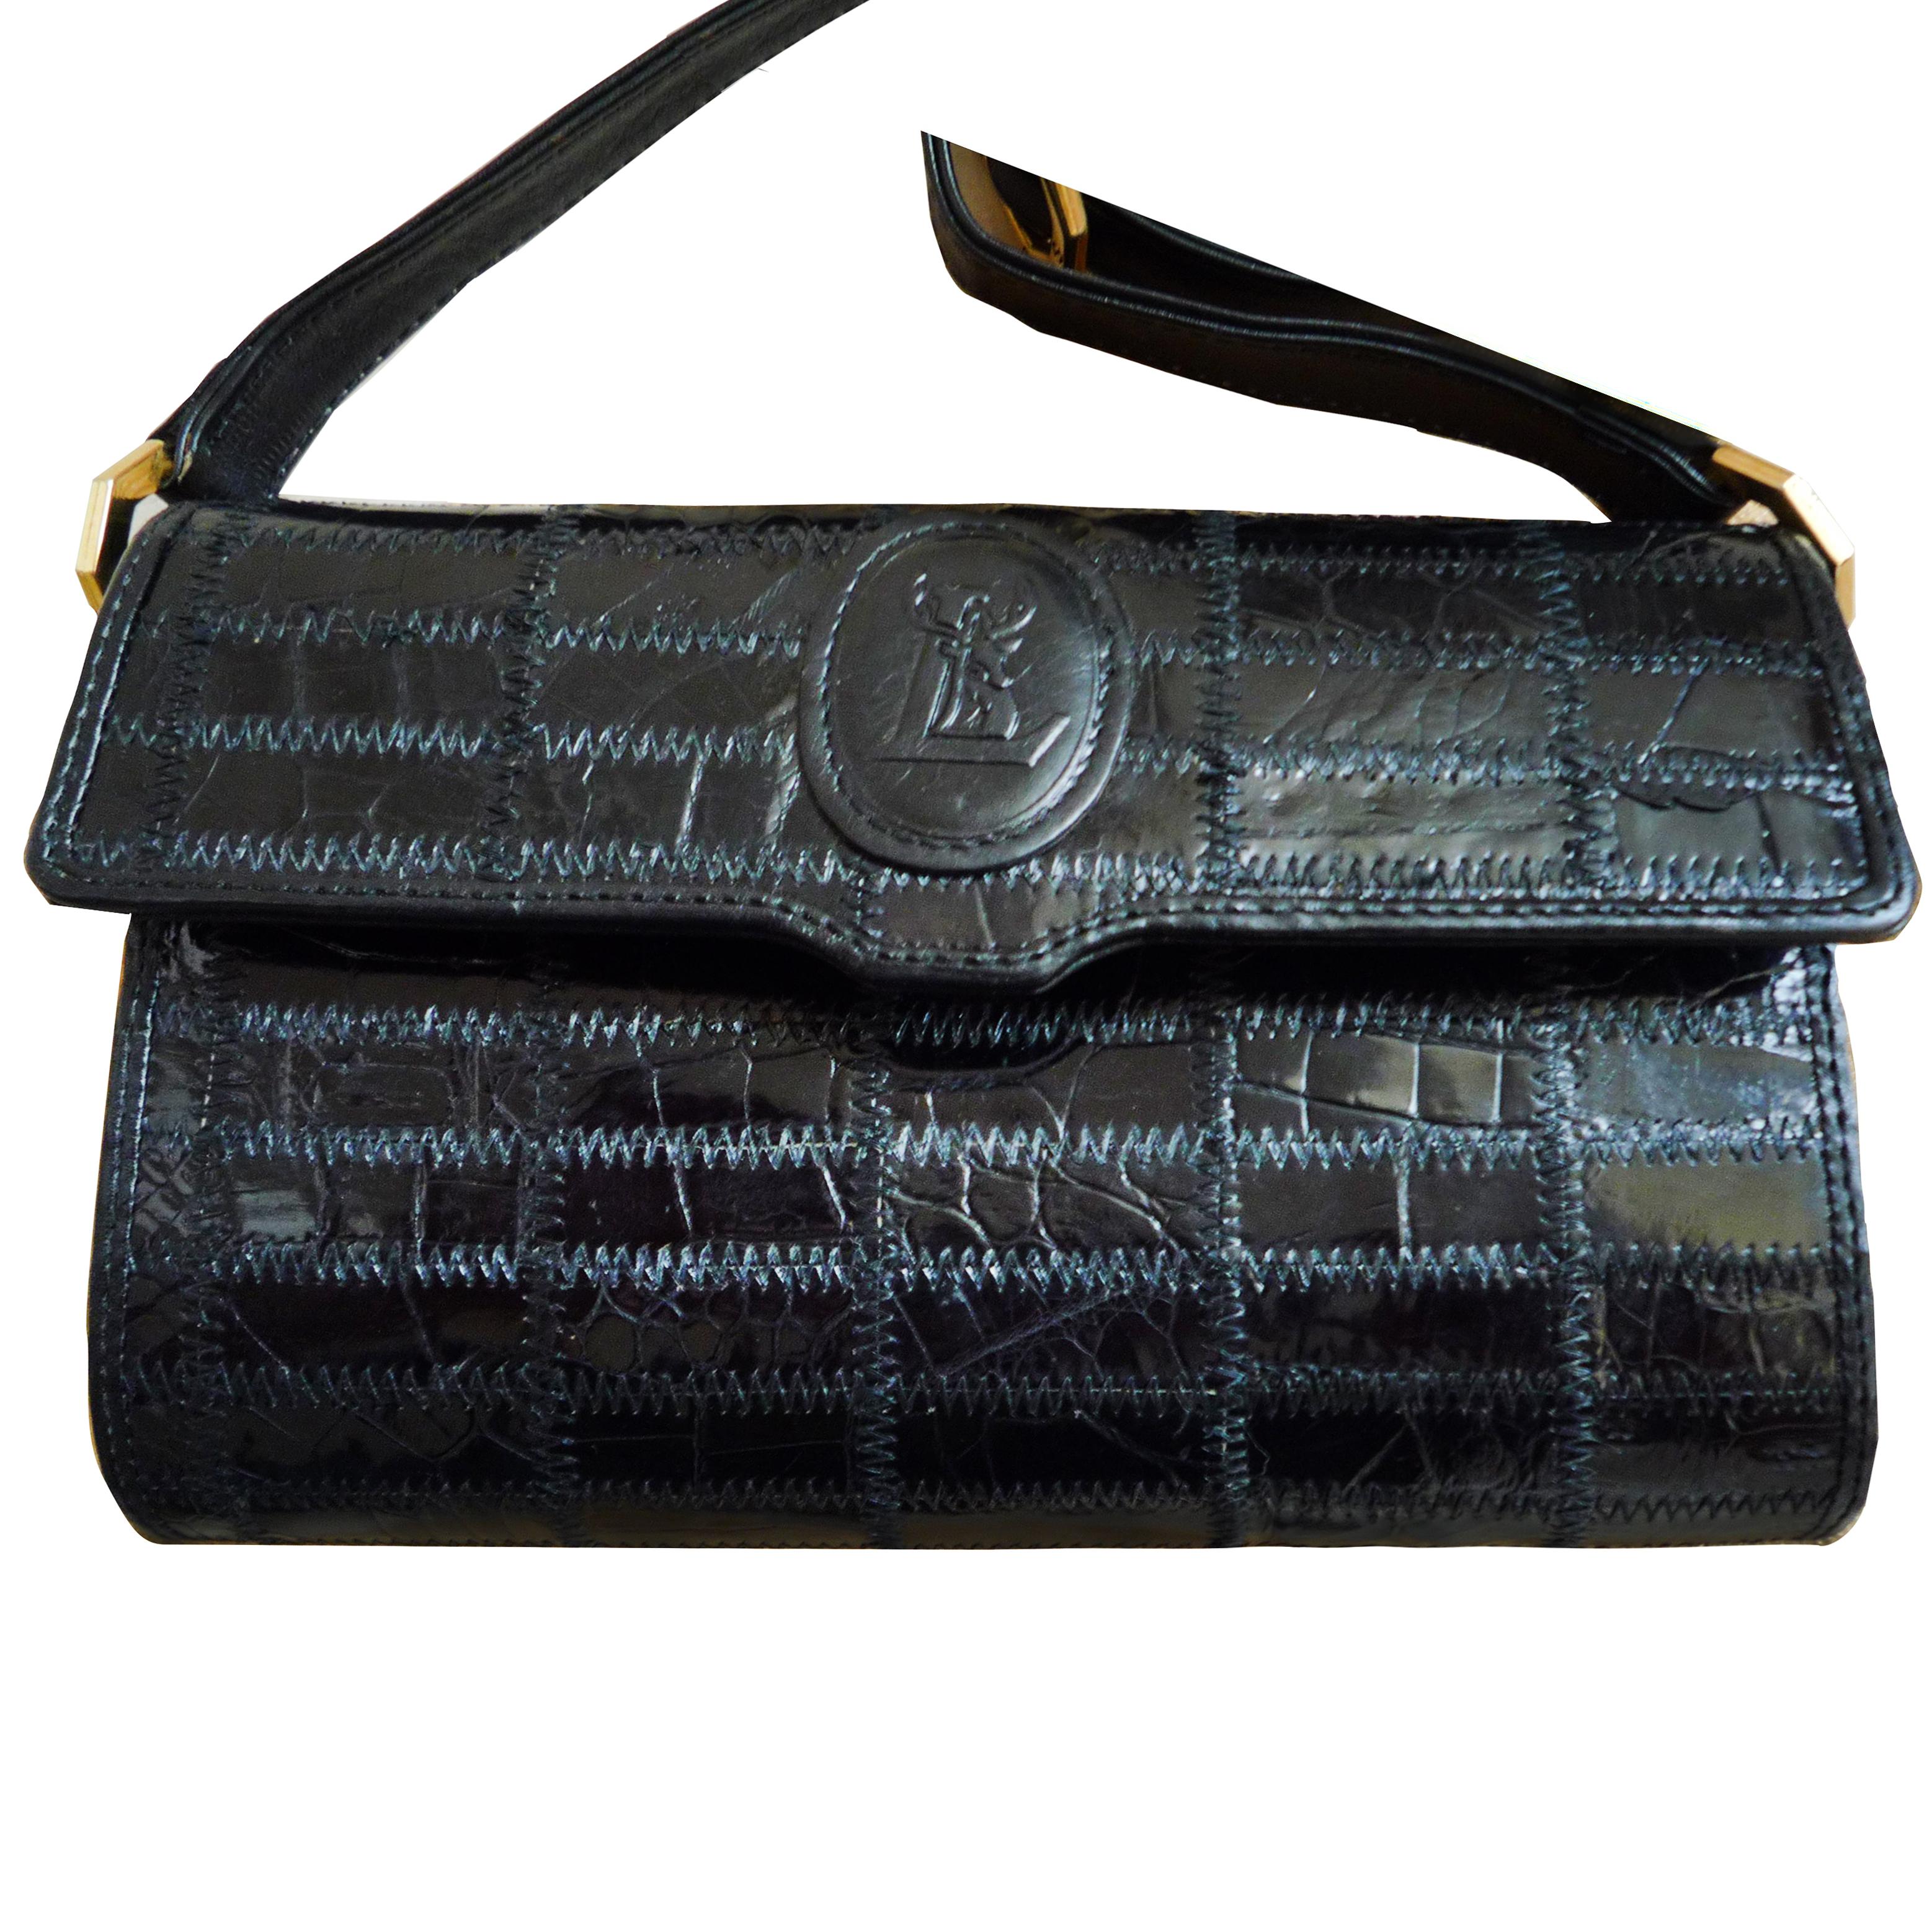 48ce73a19fd4c Crocodile Liz of Paris women s clutch bag